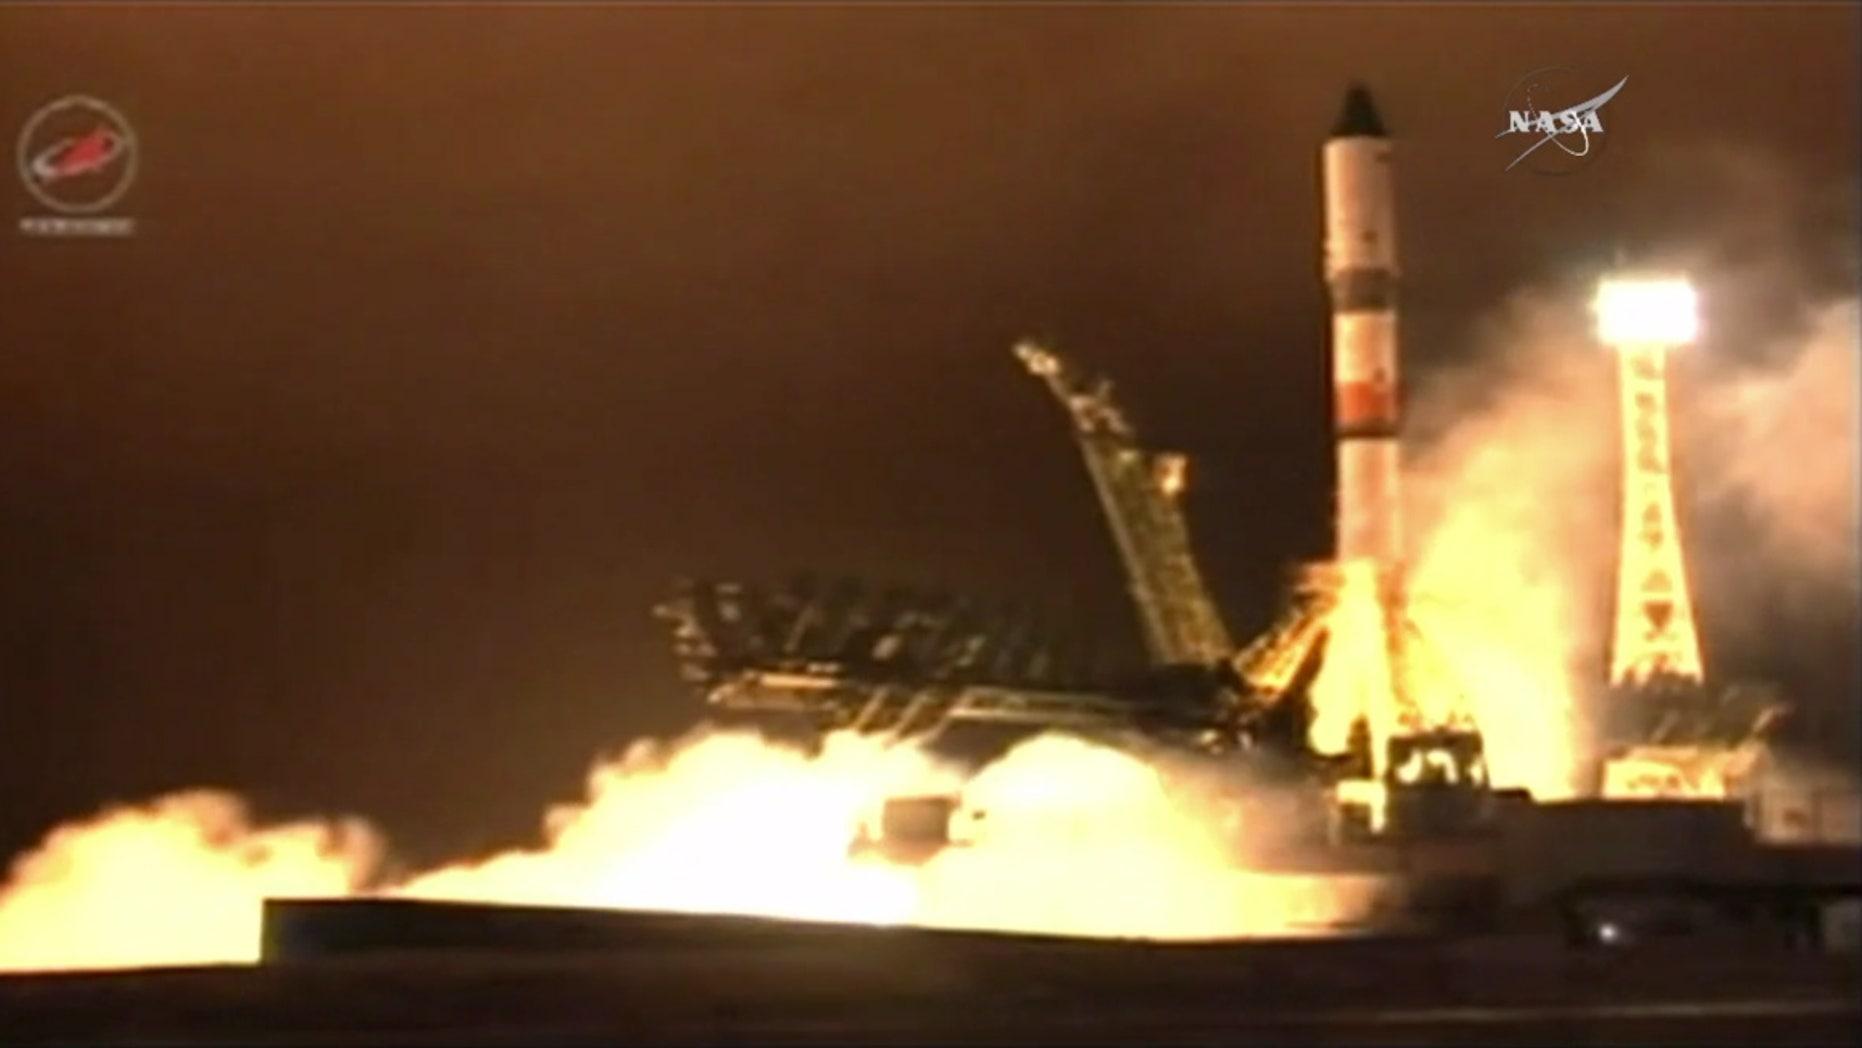 Progress 63 (63P) Spaceship Launch